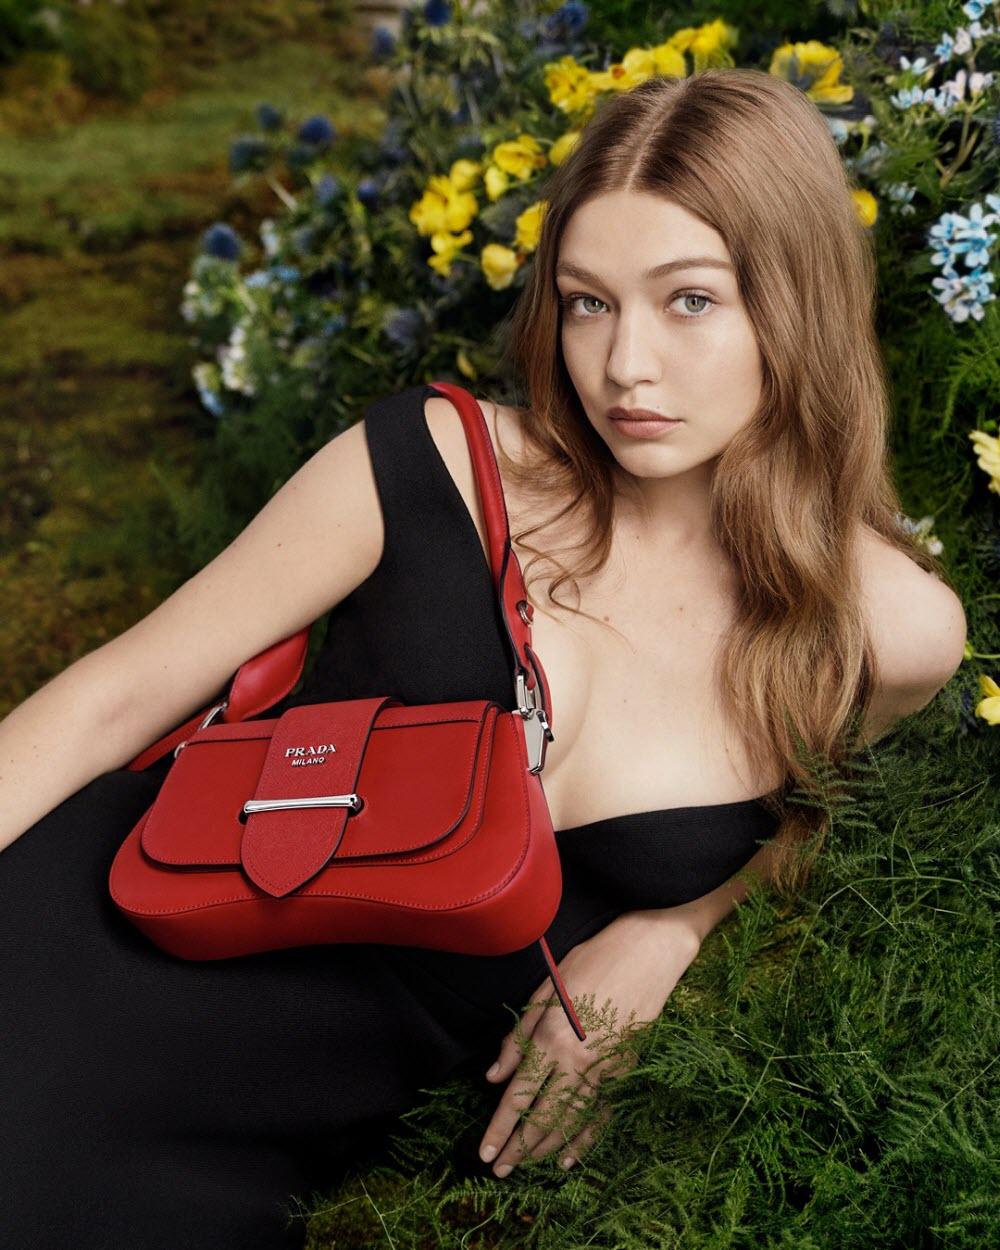 Gigi Hadid with stylish Prada bag